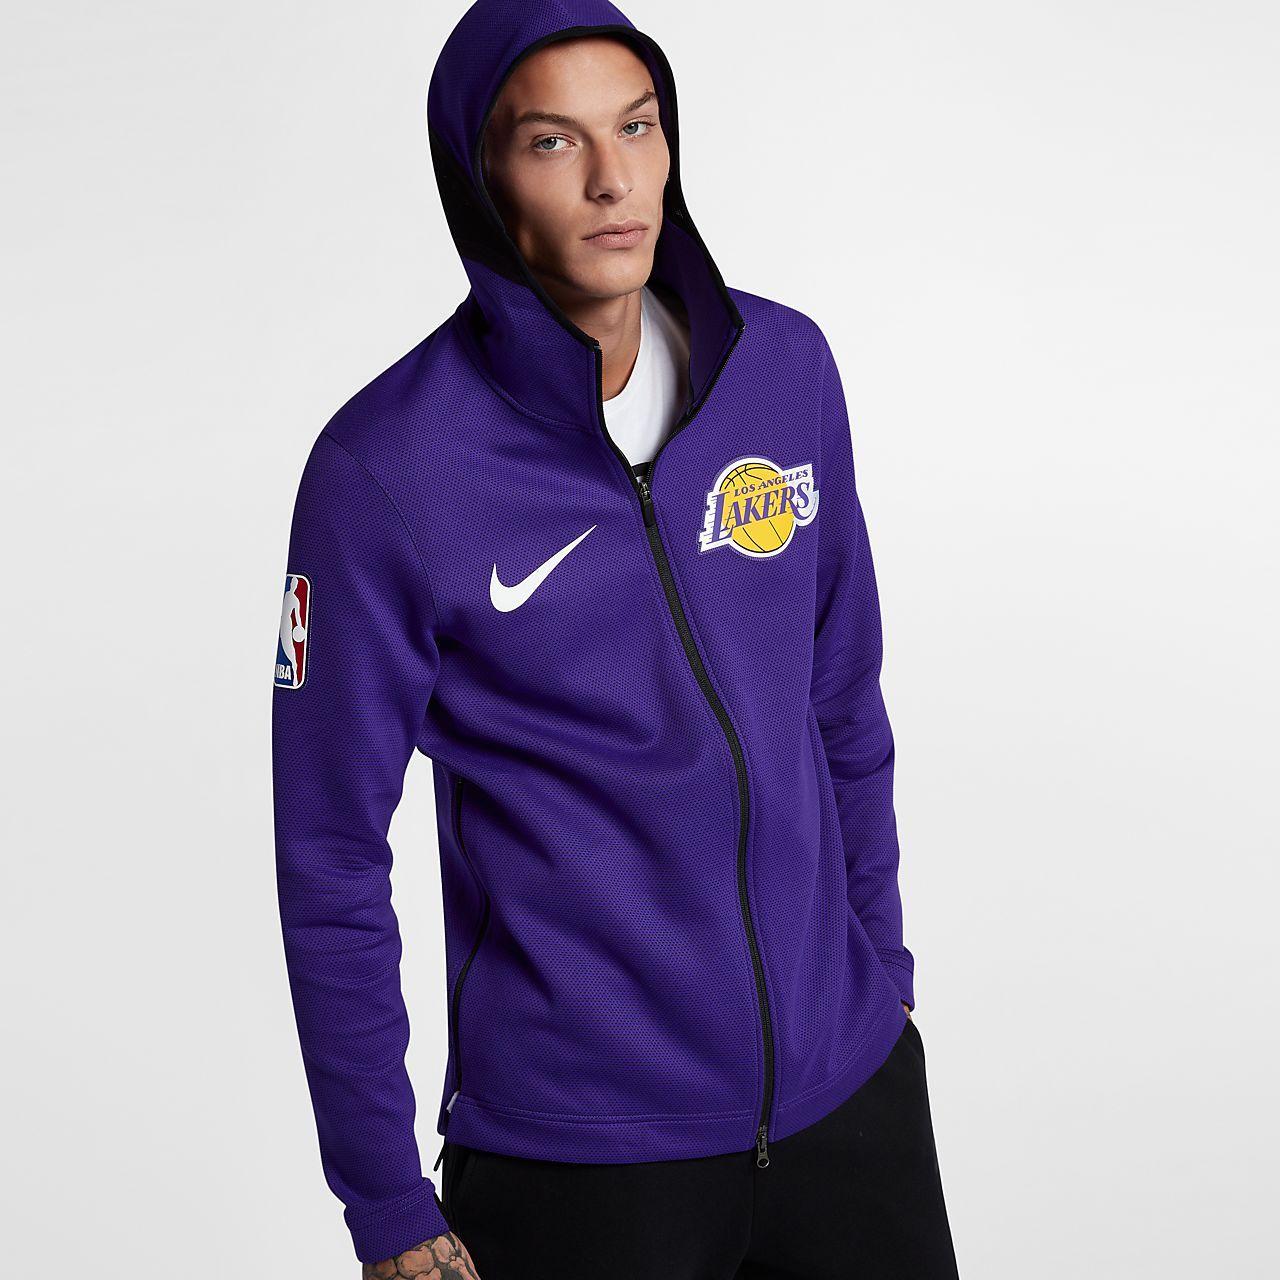 e6fcf114fcfa Los Angeles Lakers Nike Therma Flex Showtime Men s NBA Hoodie Nike  Basketball